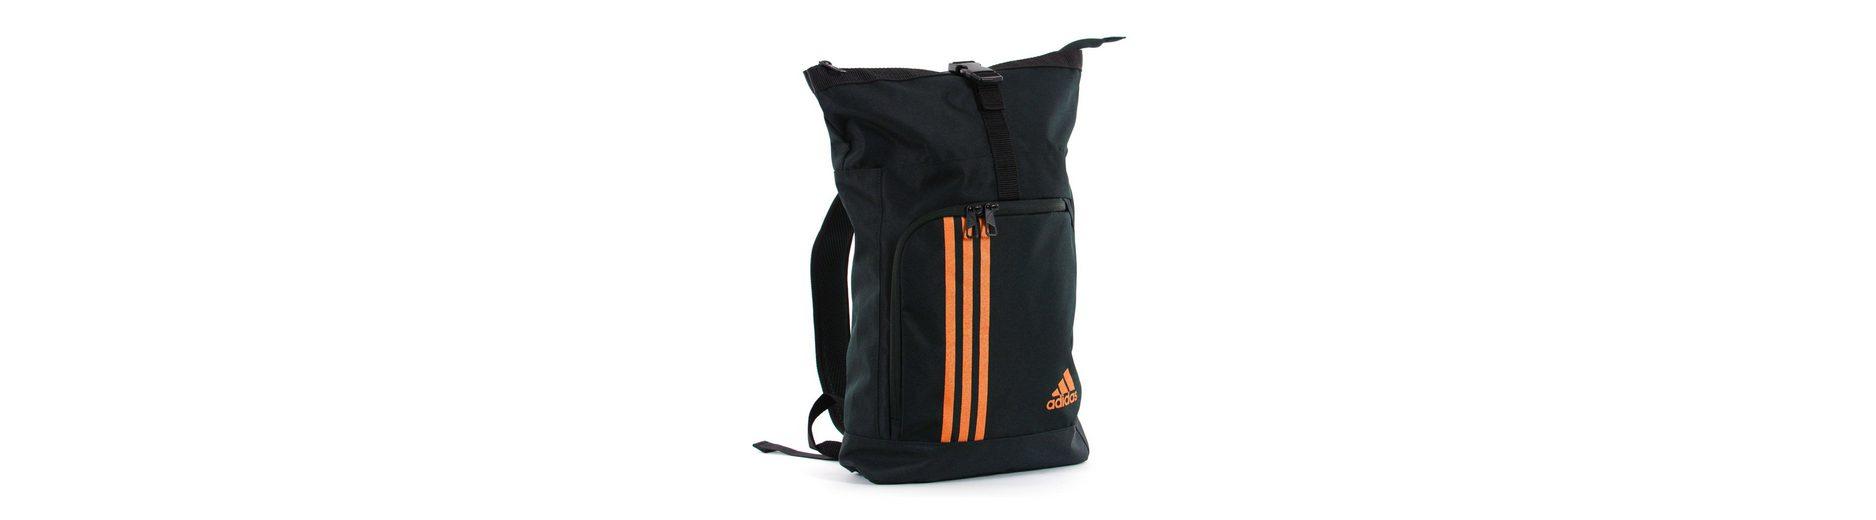 Adidas Performance Sporttasche, »ADIACC041 orange«